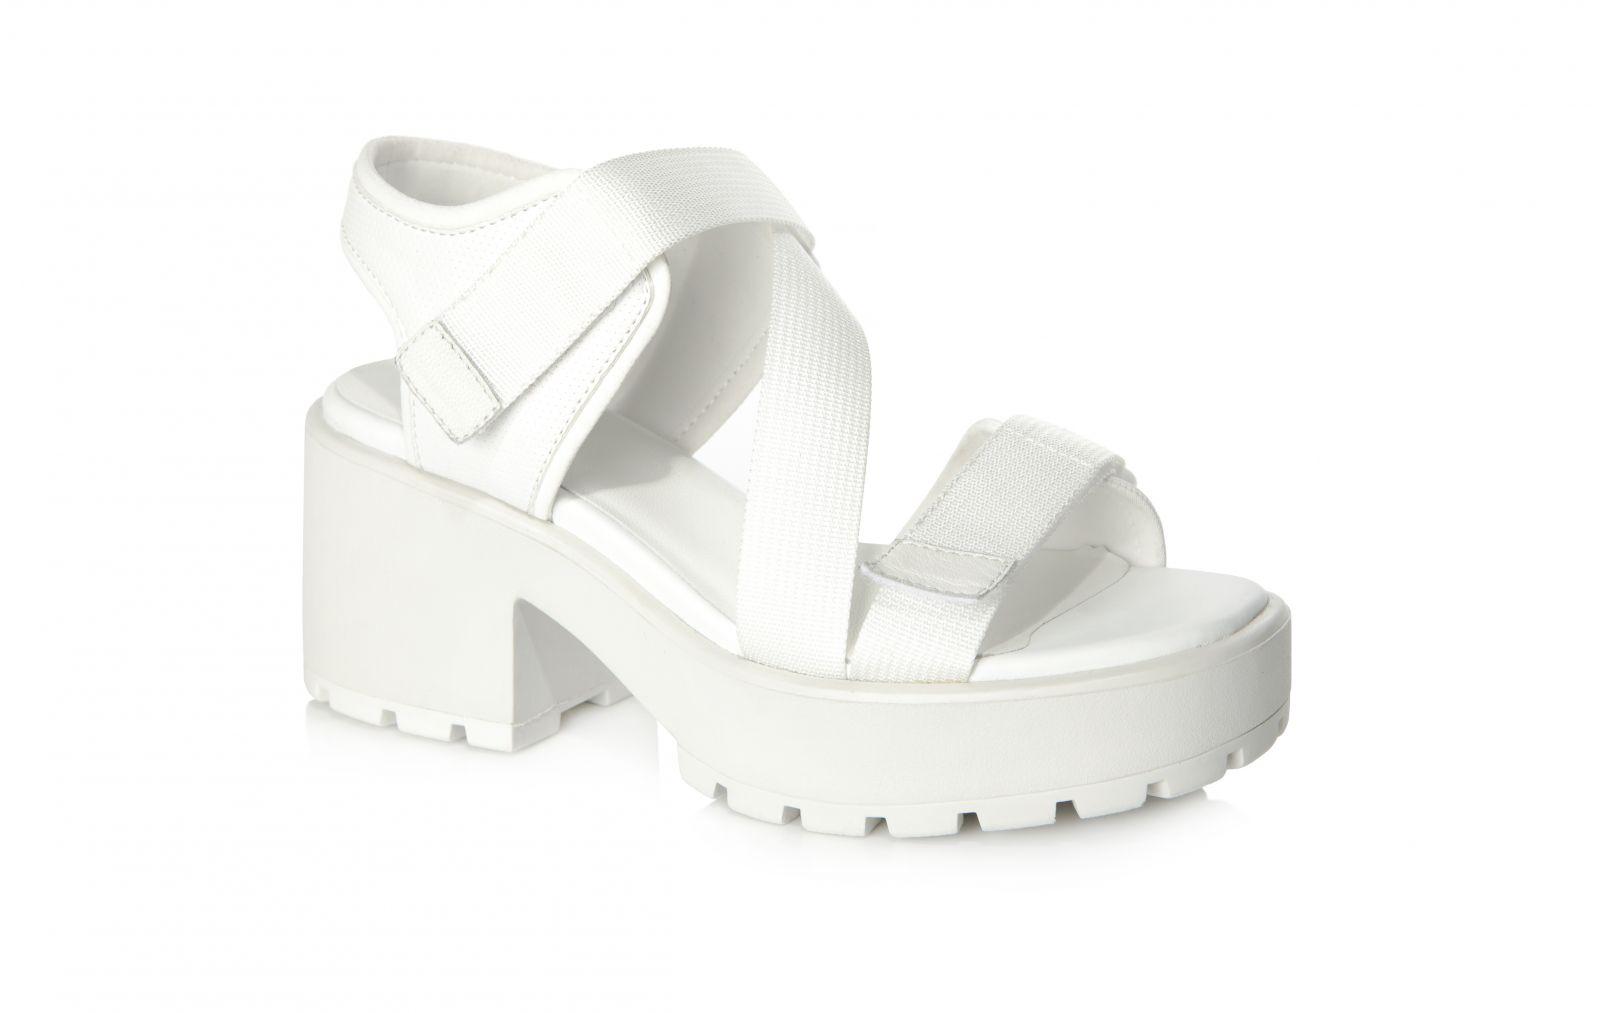 Коллекция обуви Intertop весна-лето 2014 - фото №1